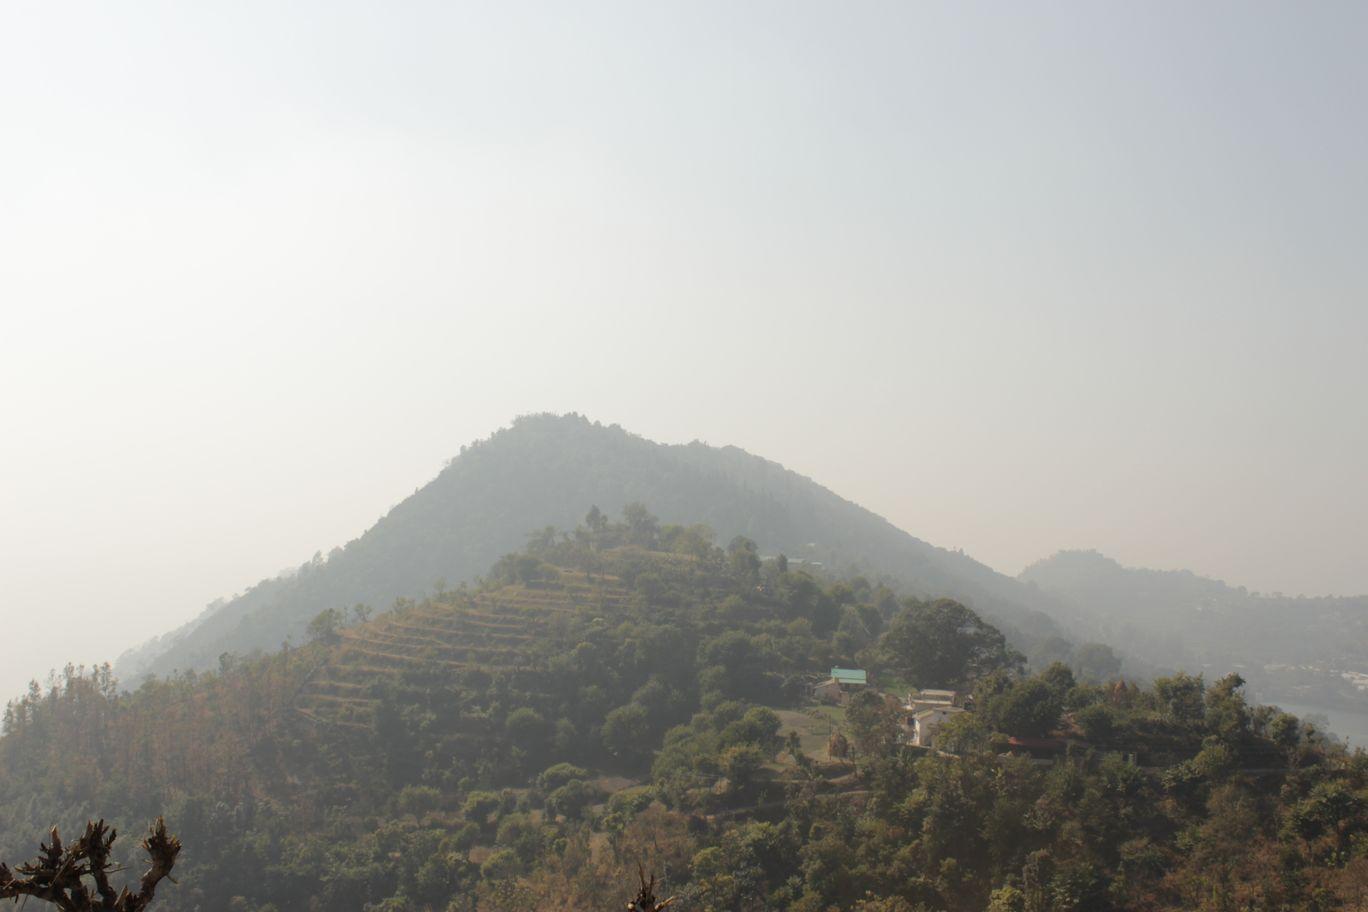 Photo of Naukuchia Tal - Hidden gem of kumaon By Dishu Khanna